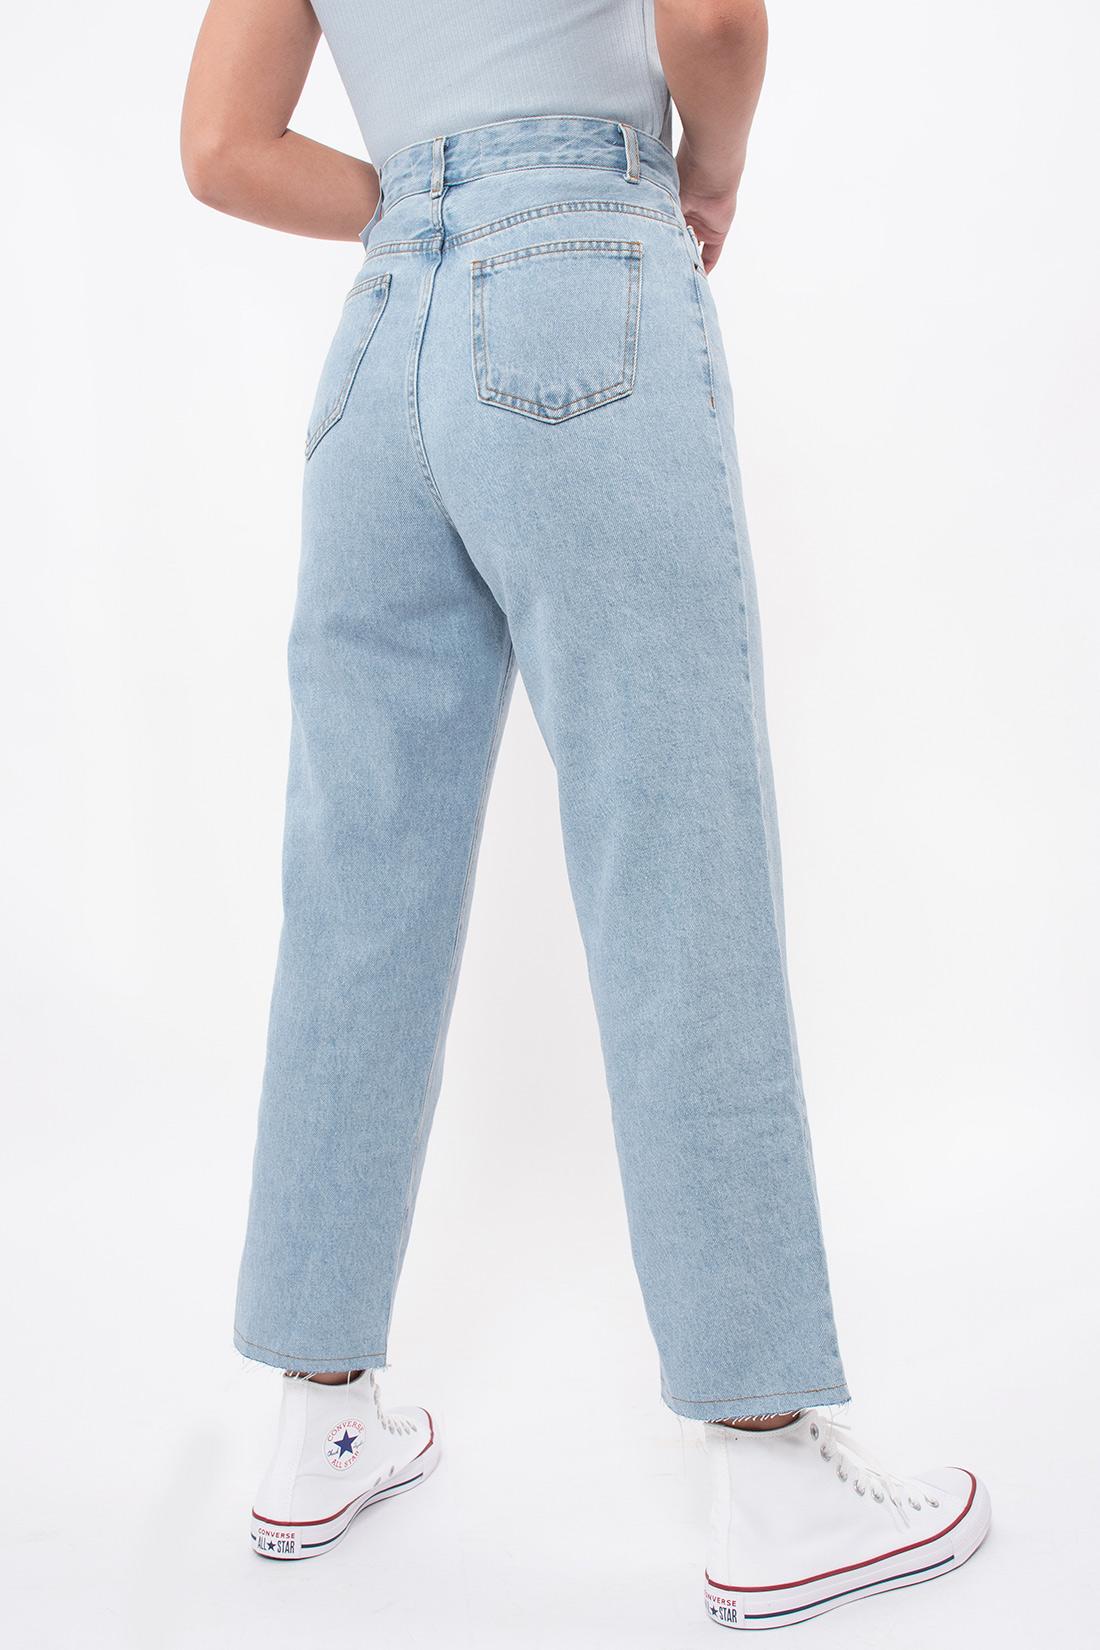 Calca Jeans Hering Reta